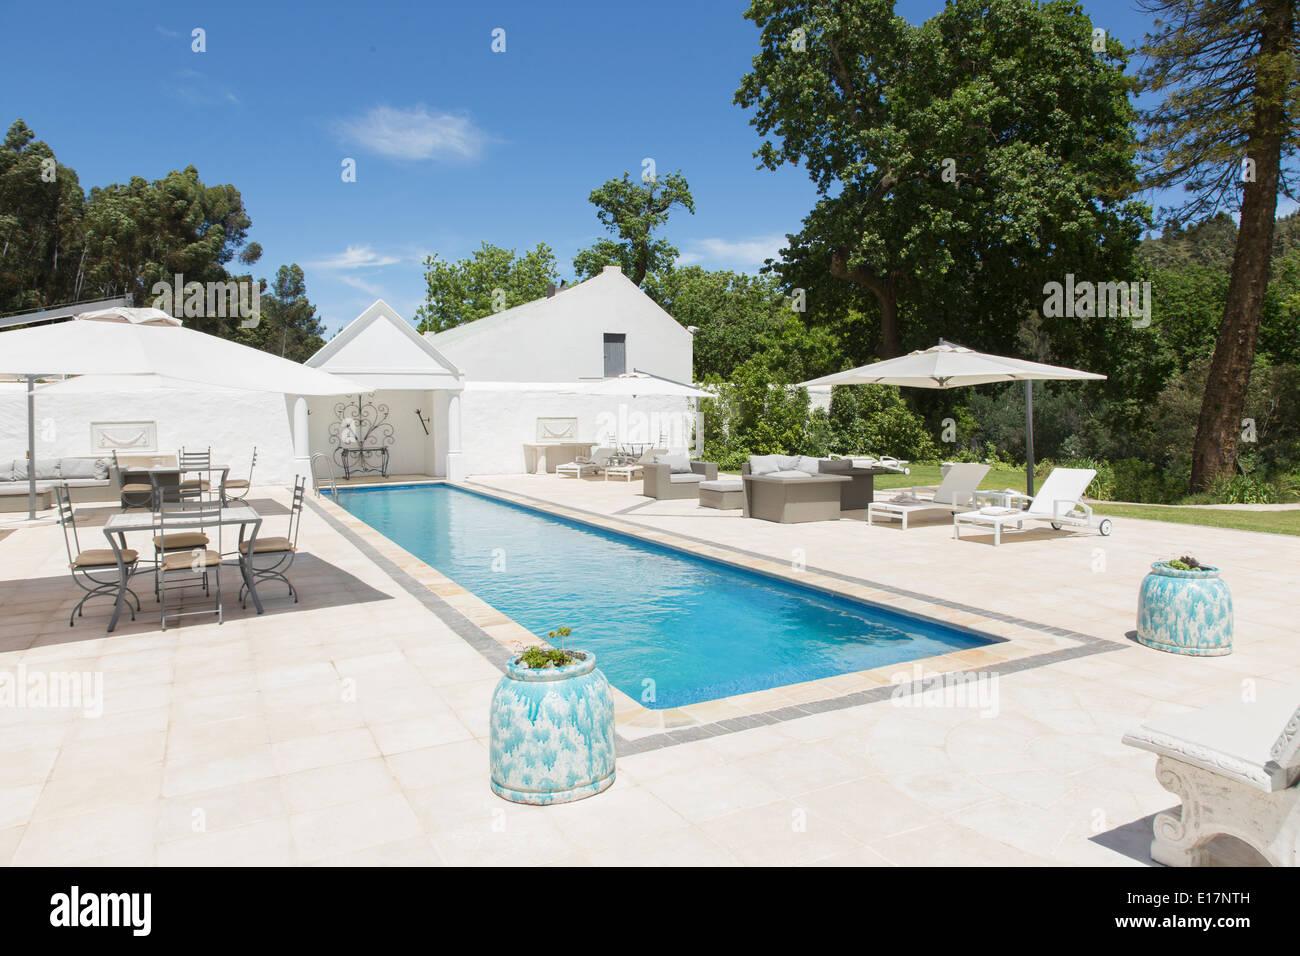 Luxury lap pool - Stock Image